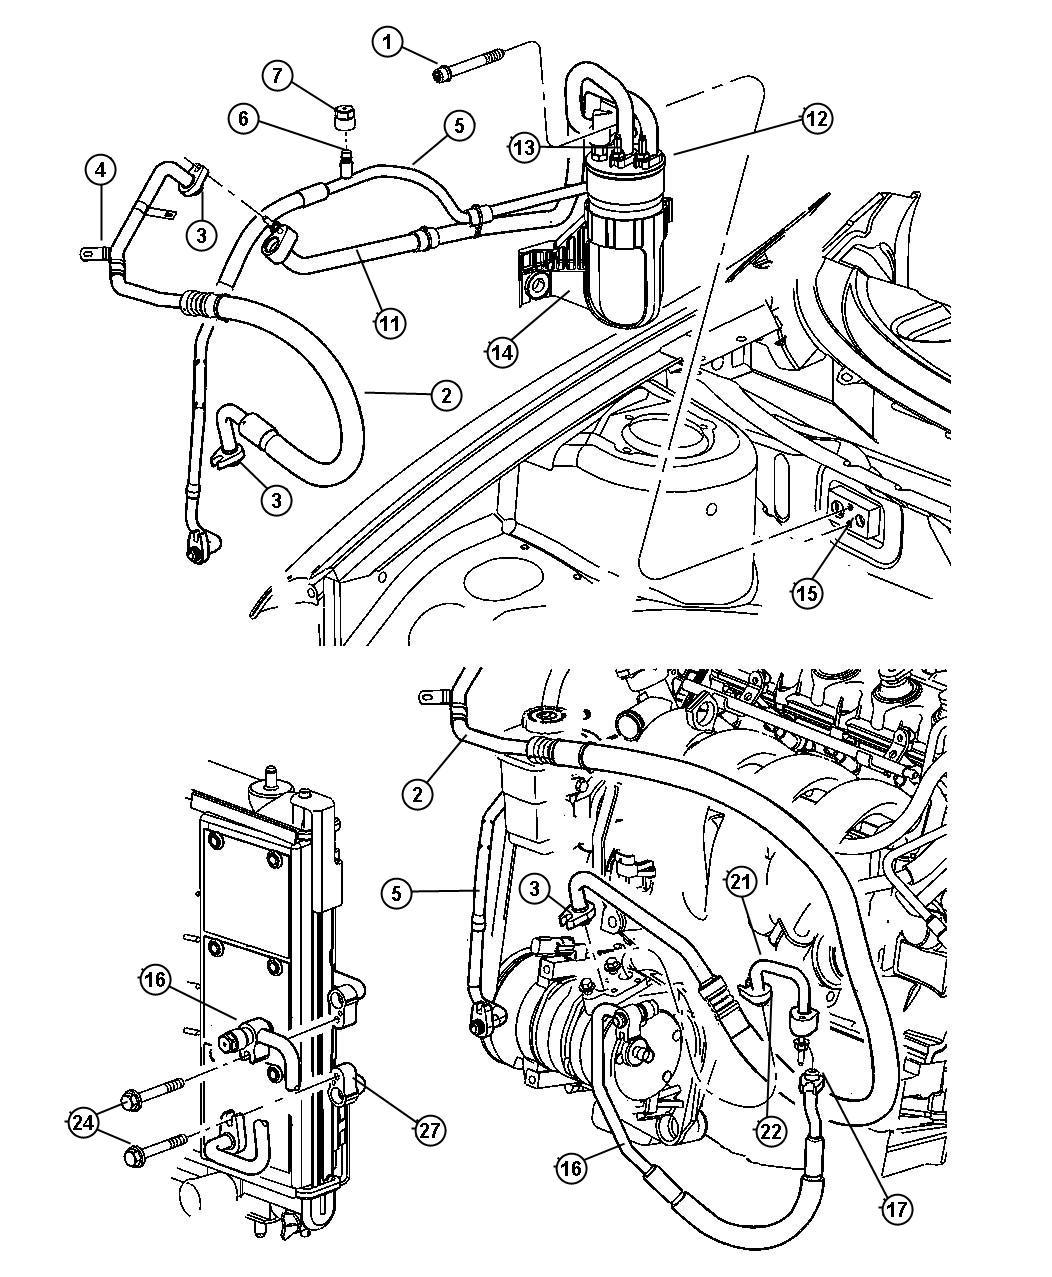 2007 dodge nitro condenser air conditioning plumbing. Black Bedroom Furniture Sets. Home Design Ideas